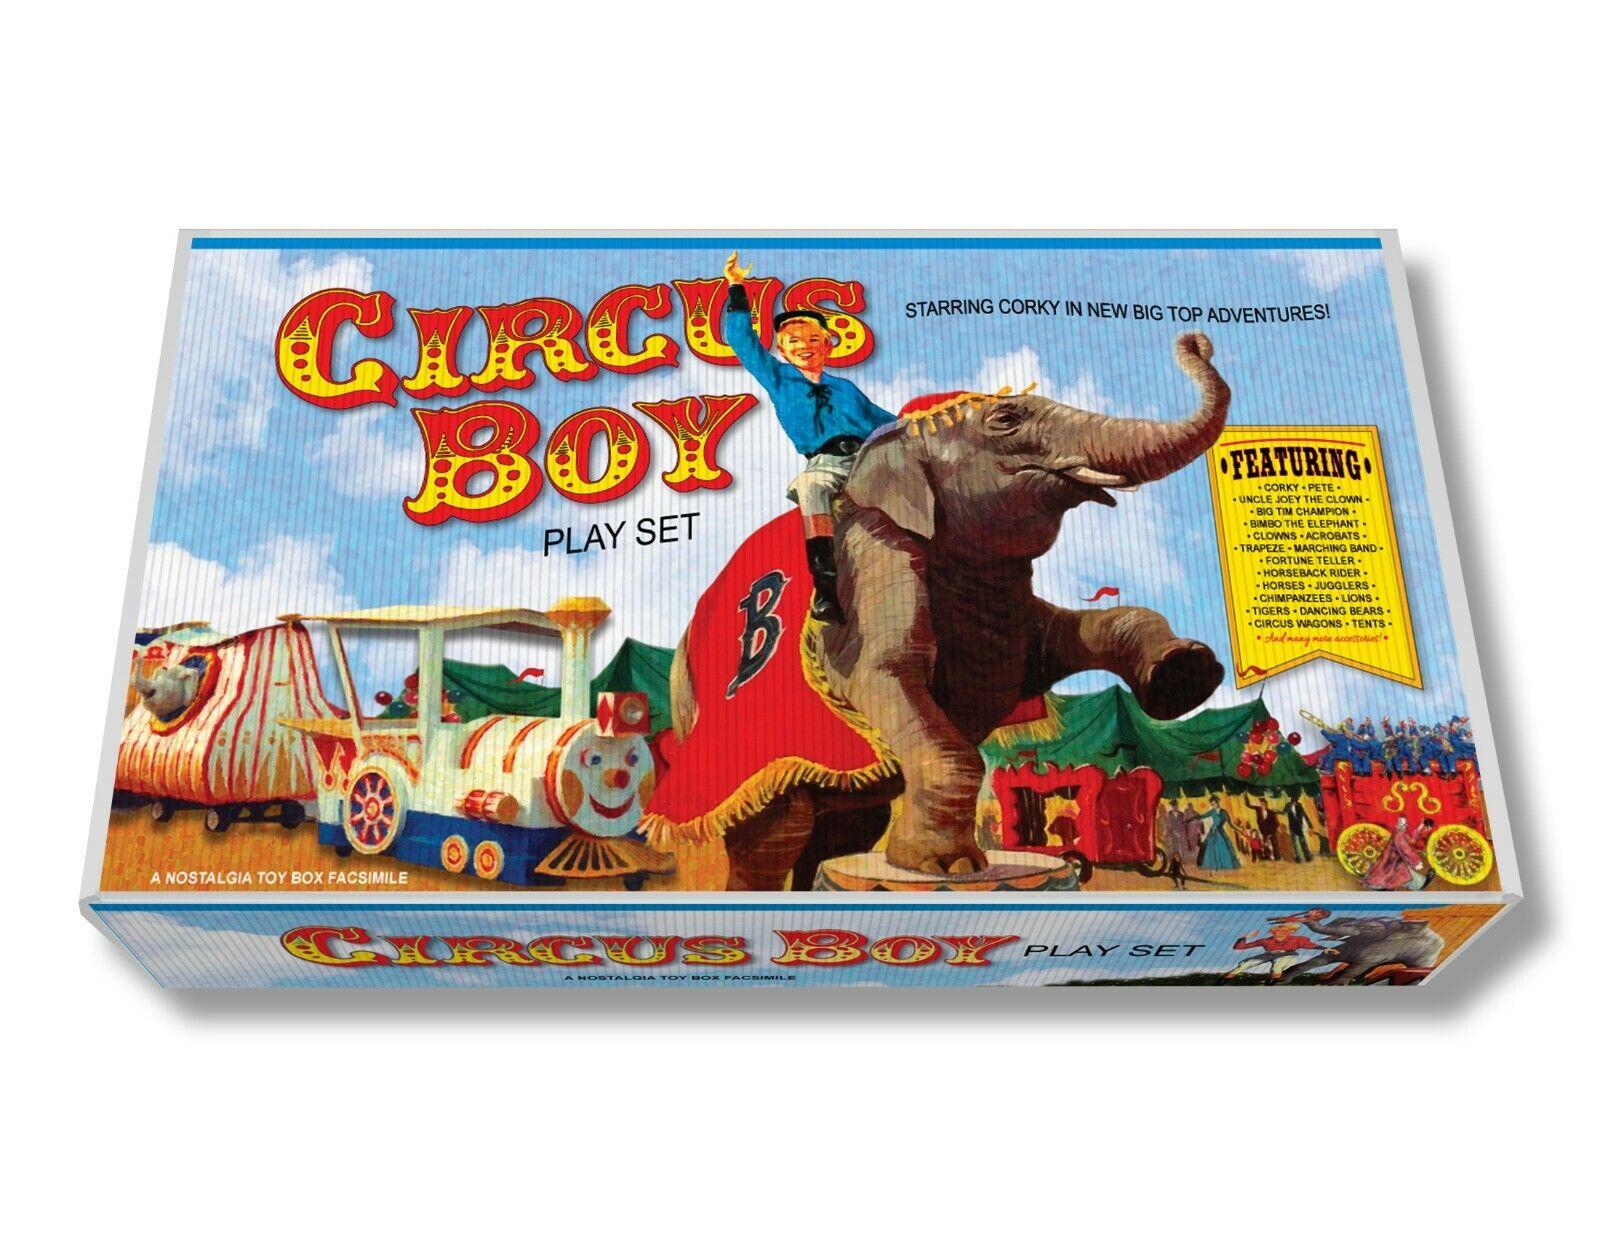 Marx zirkus junge spielen set box